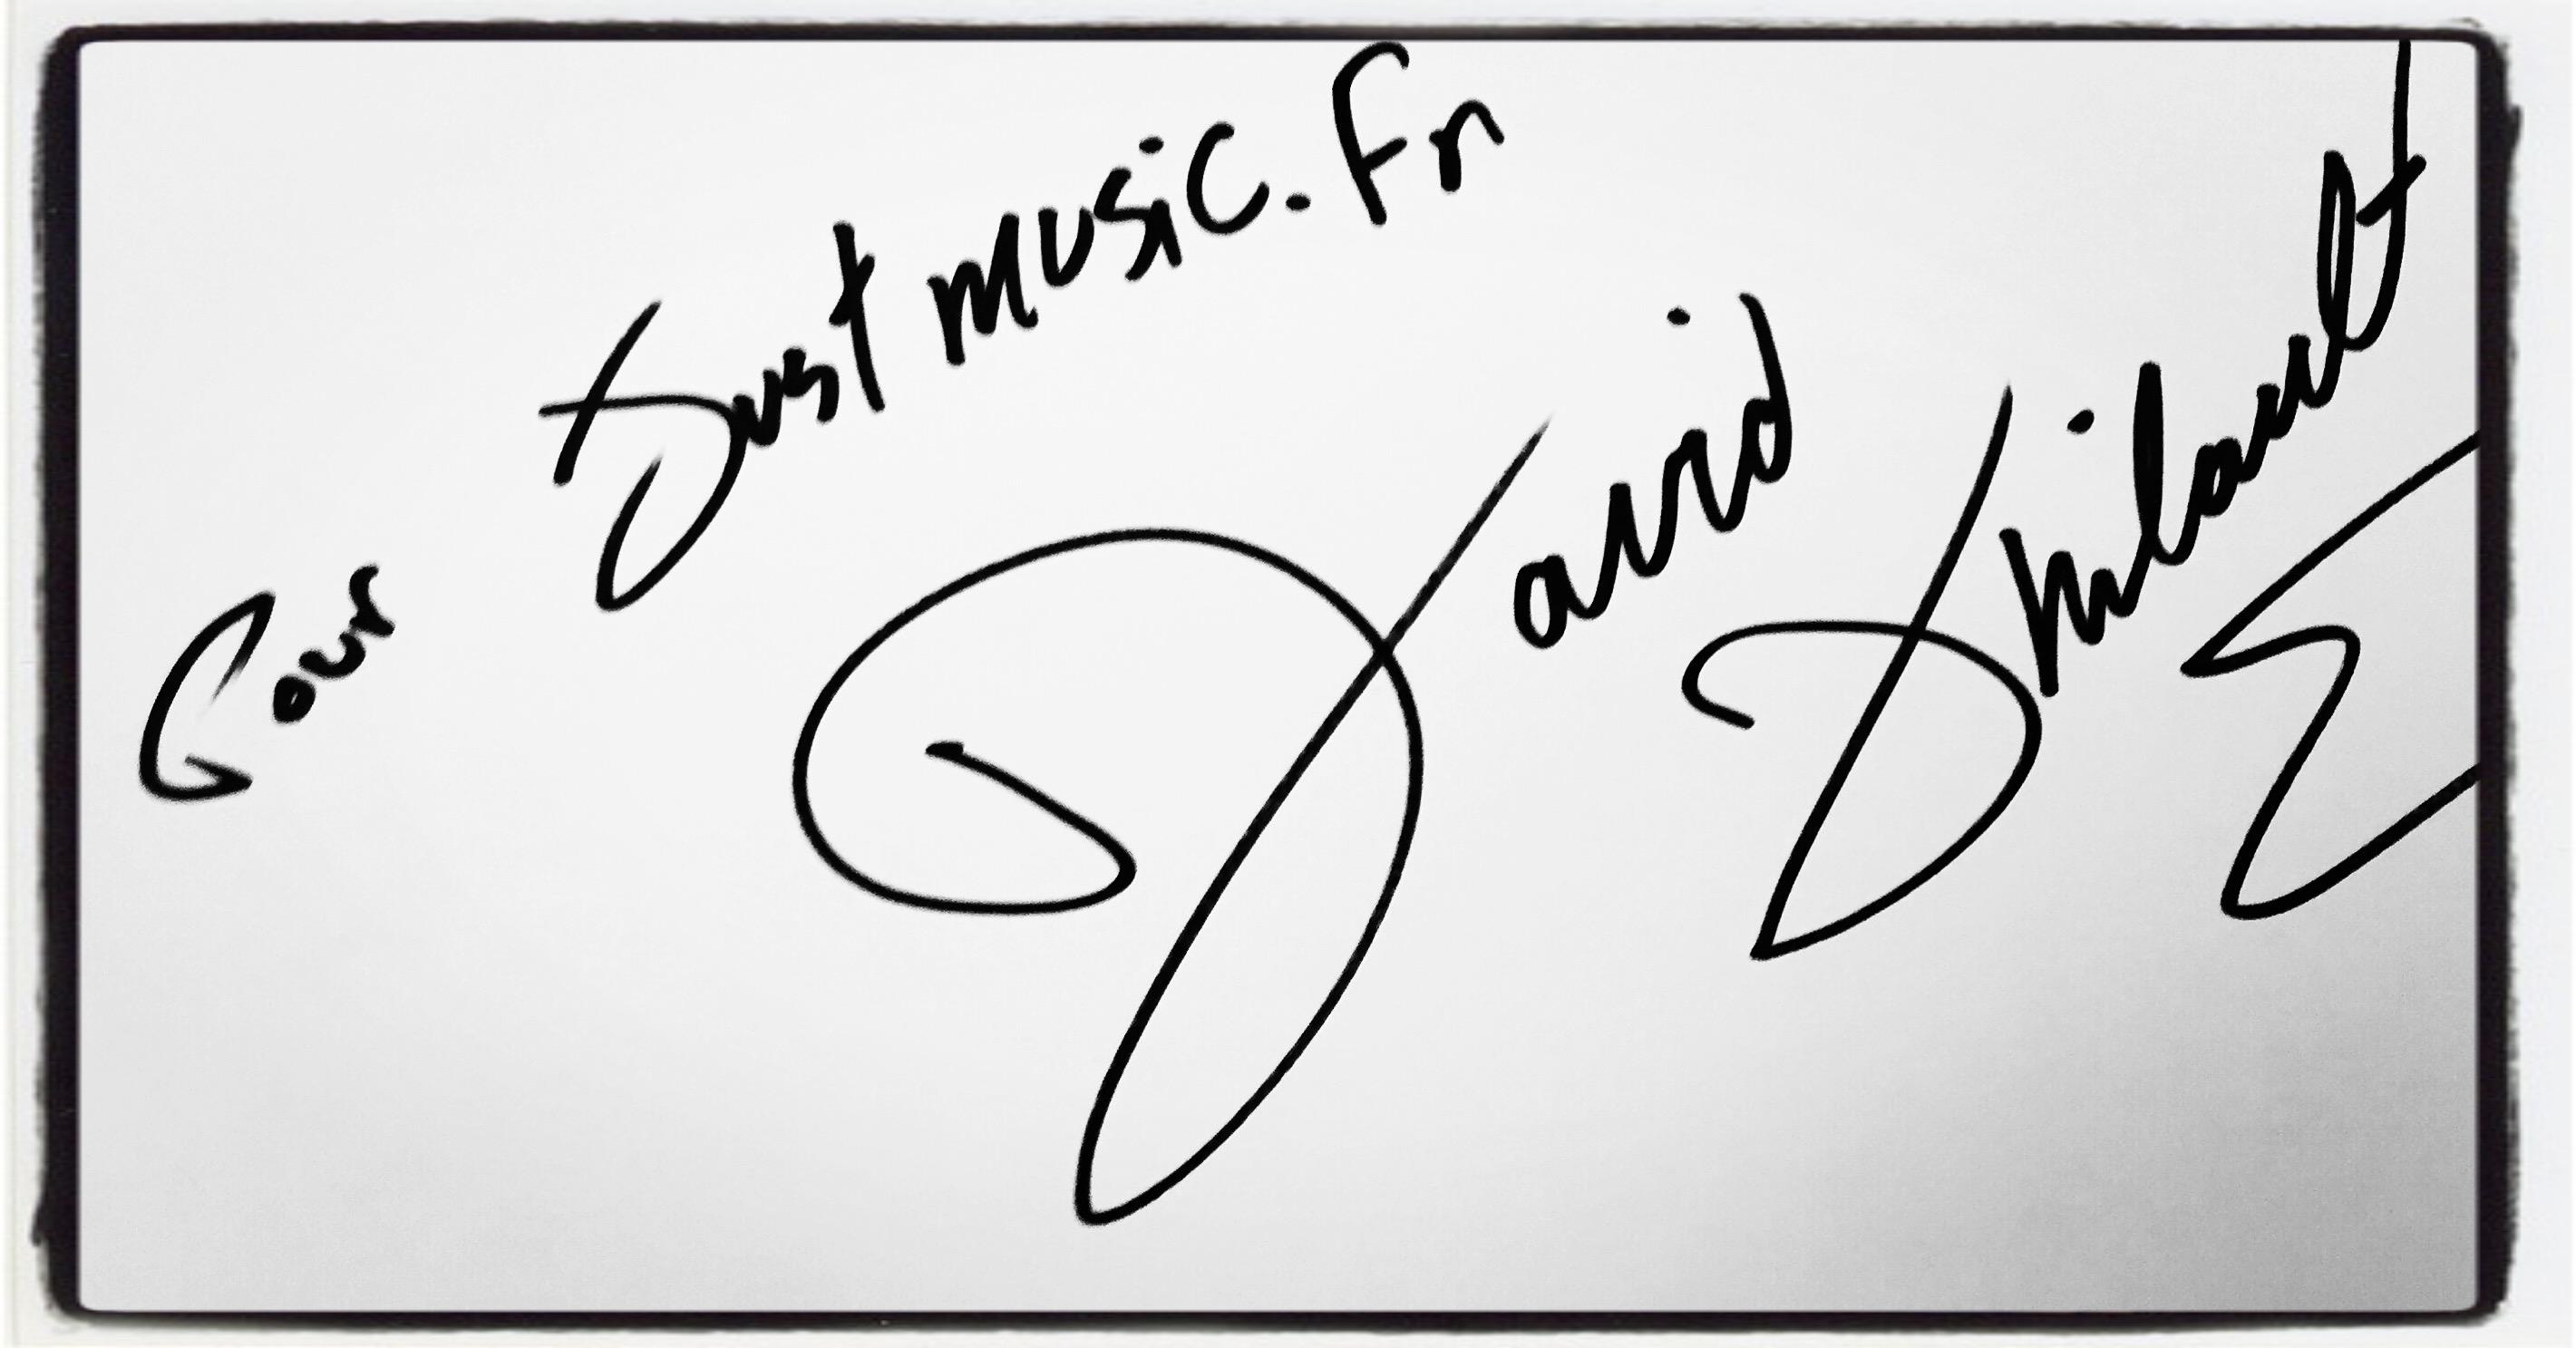 David Thibault JustMusic.fr Dédicace